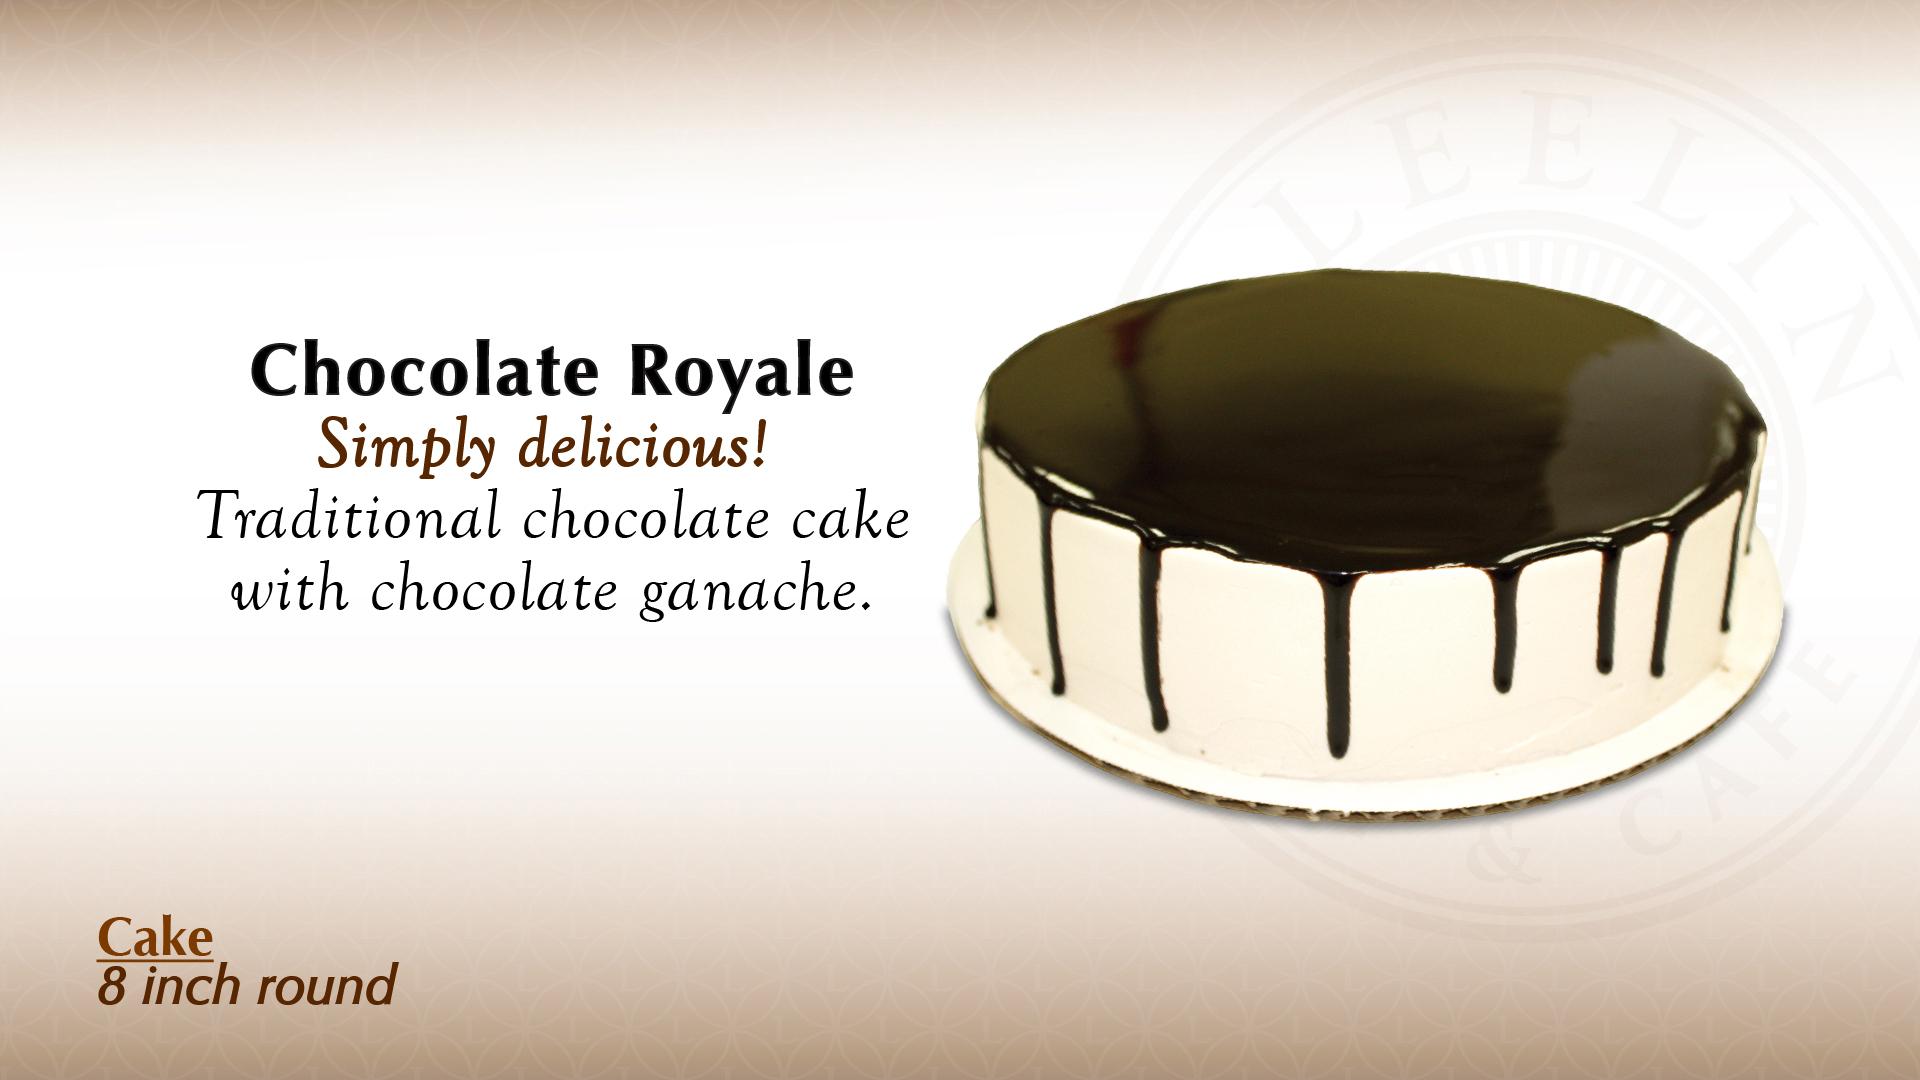 040 Chocolate Royale 1920x1080.jpg